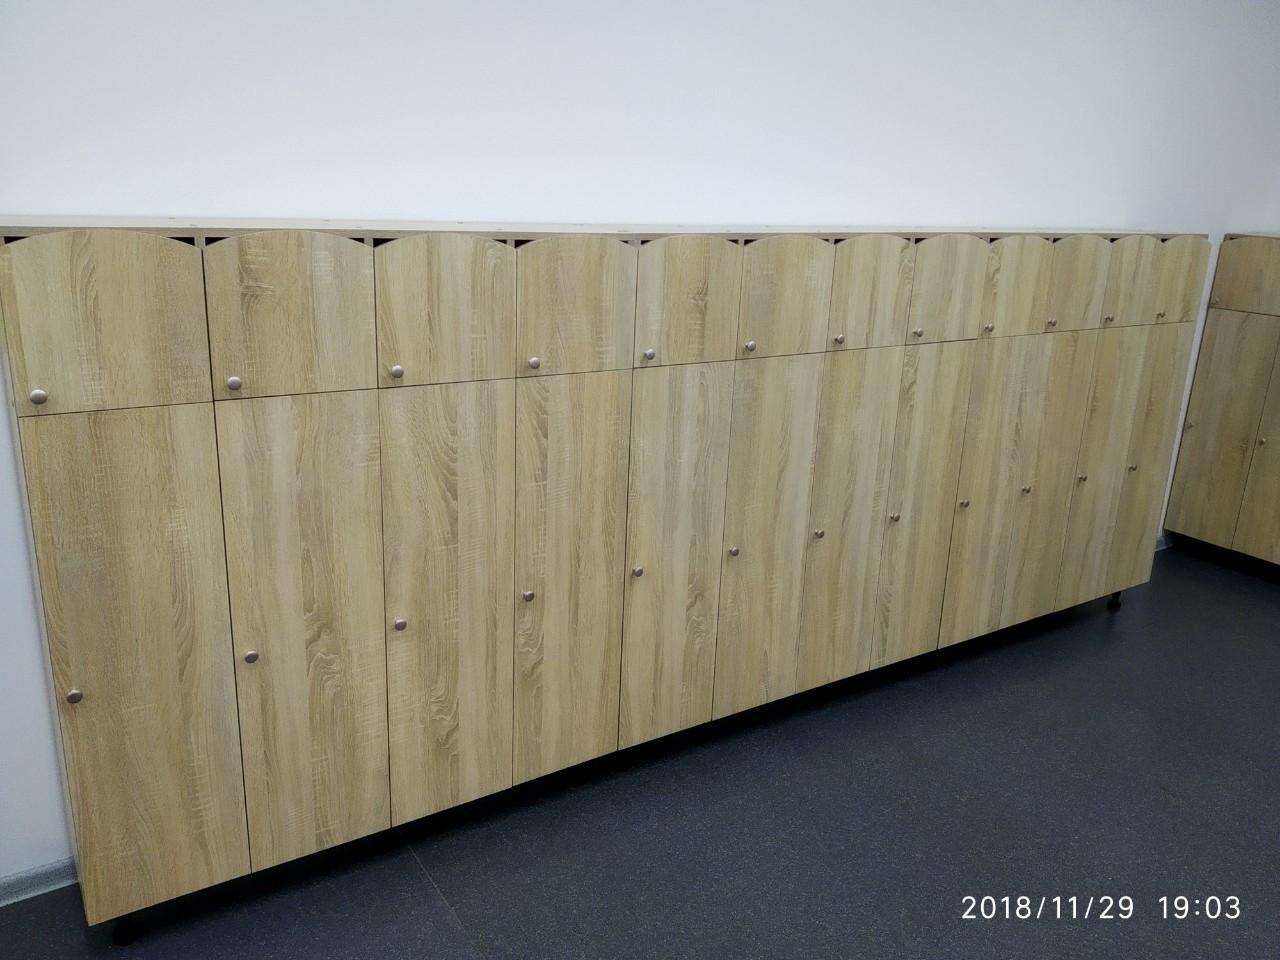 Шкаф детский для раздевалки на 5 секций. W25